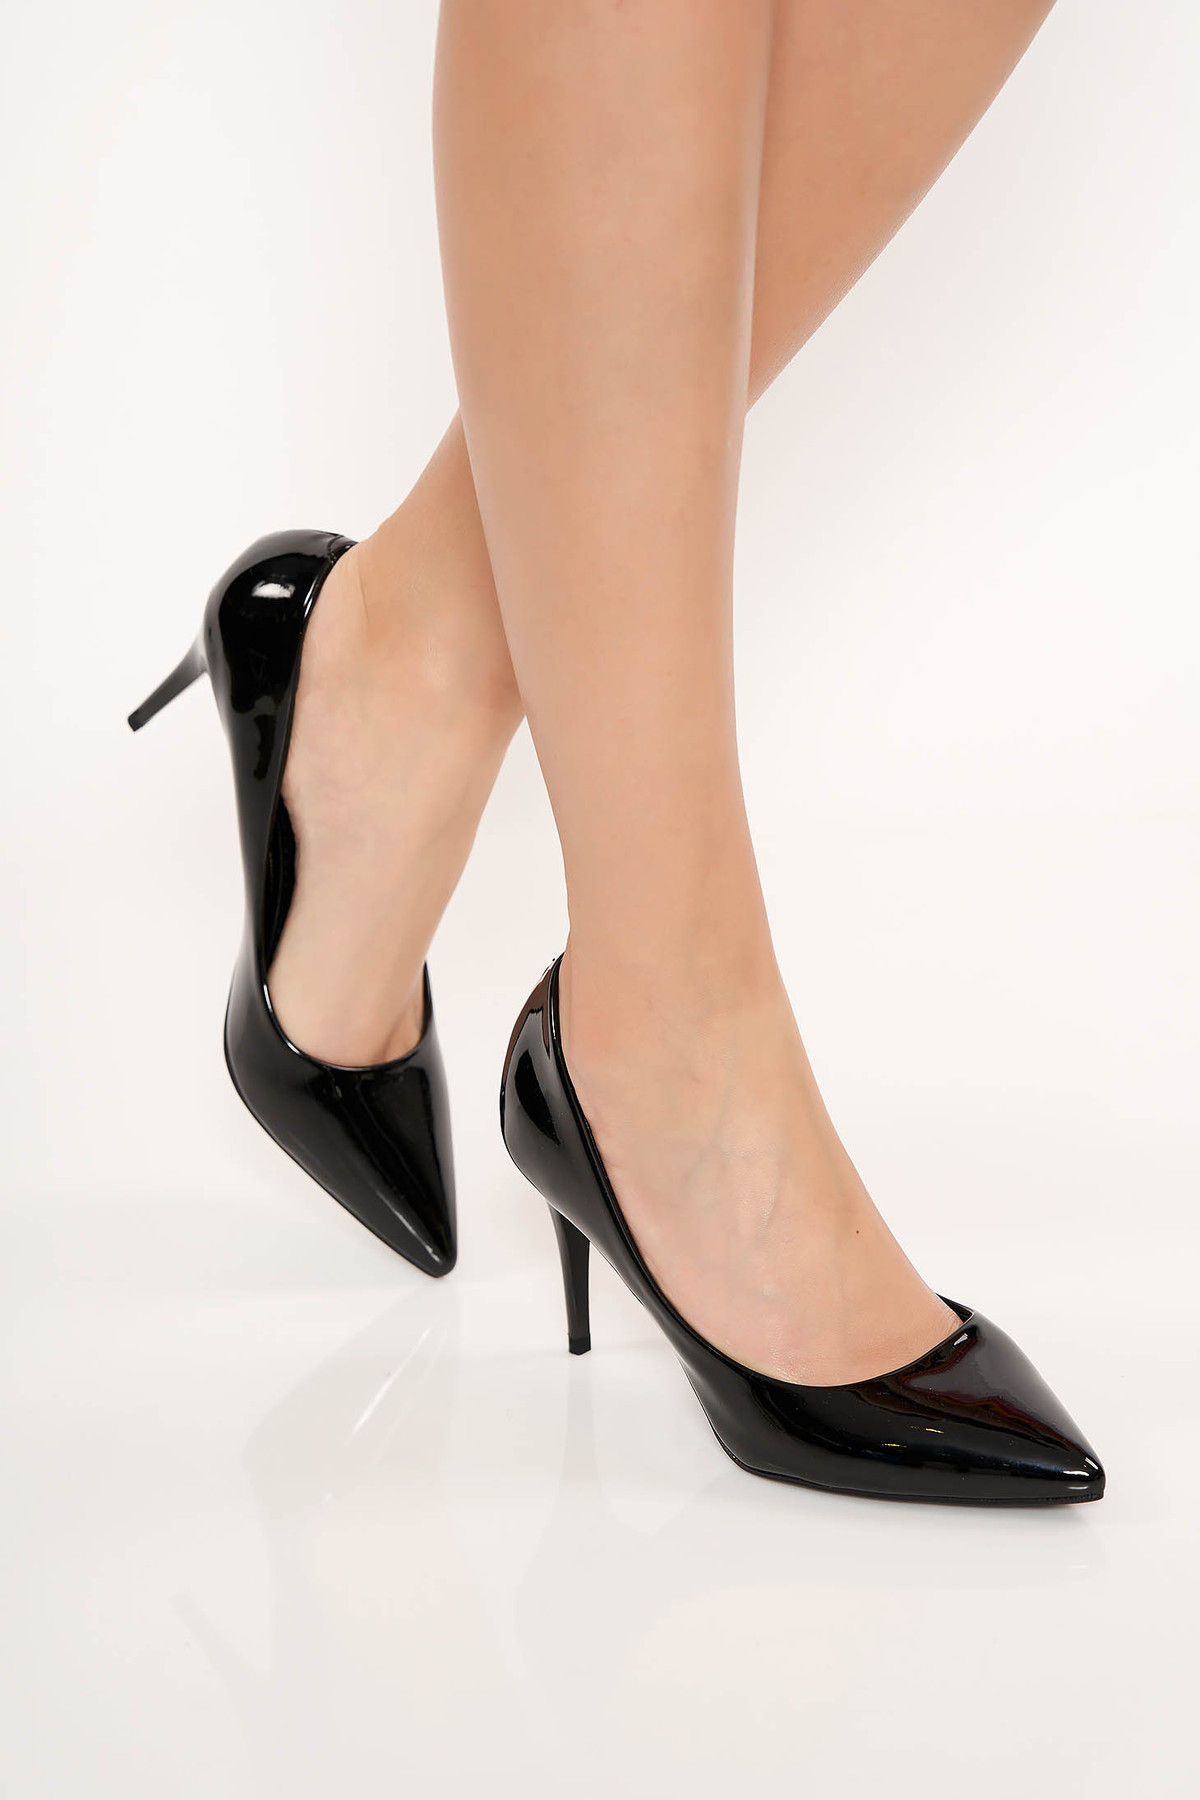 Pantofi negri eleganti din piele ecologica lacuita cu varful usor ascutit